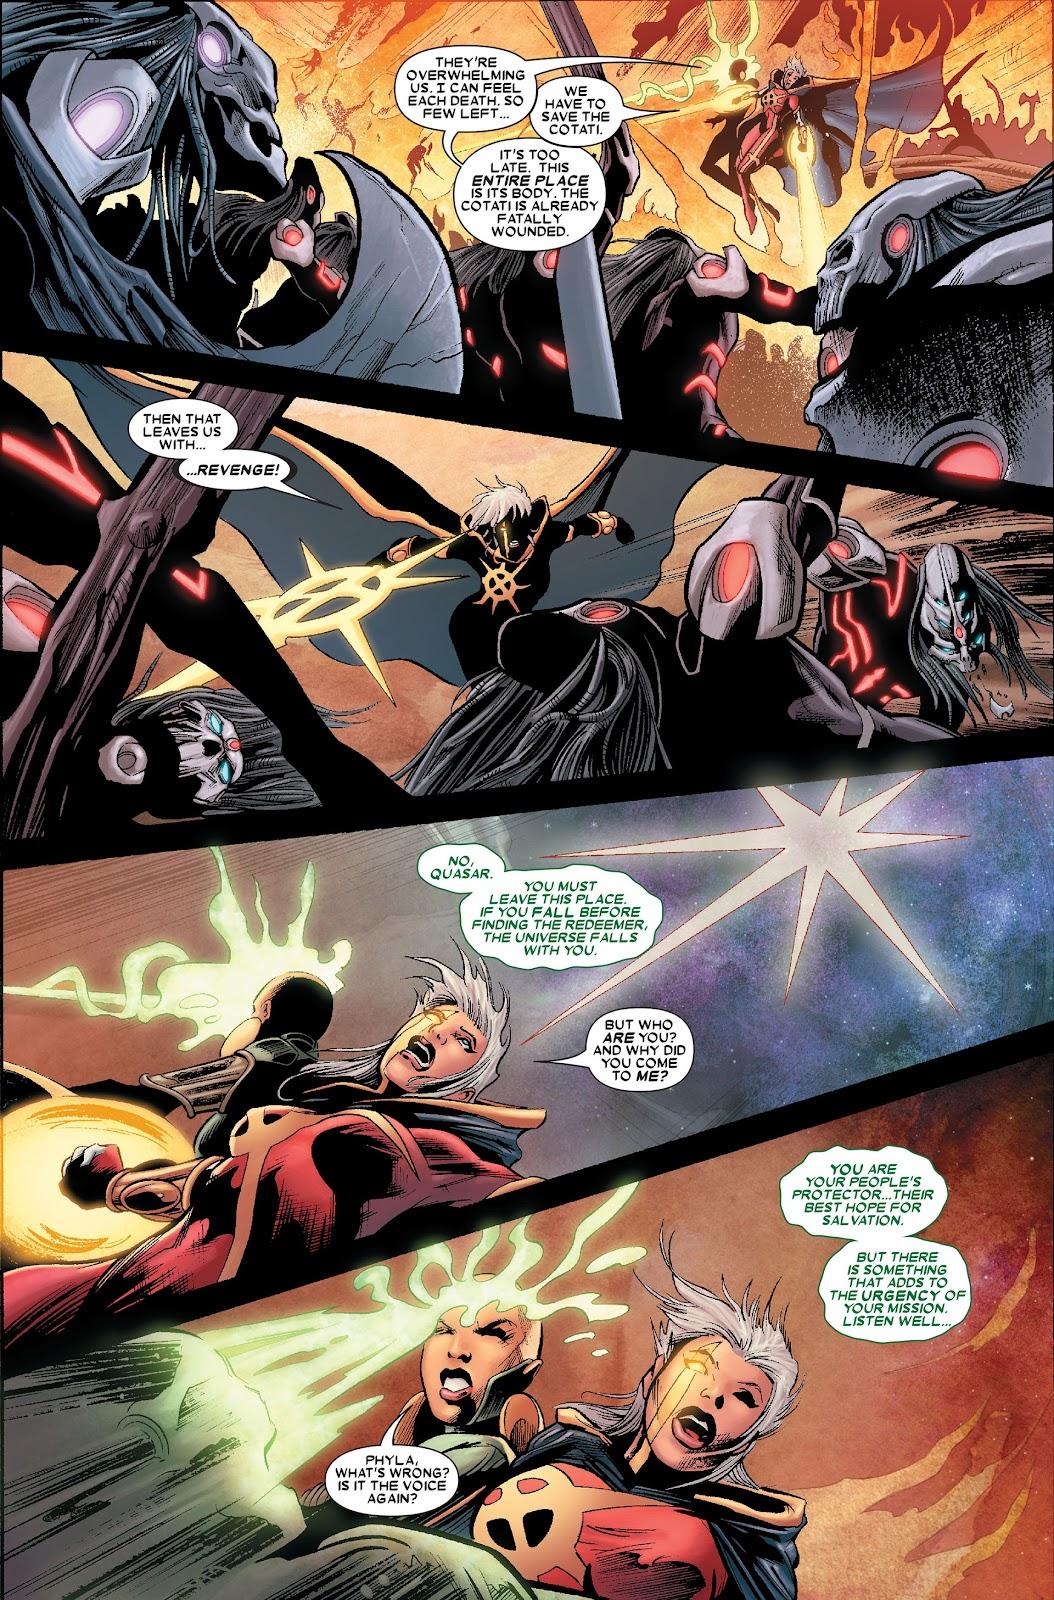 Annihilation: Conquest - Quasar issue 1 - Page 20